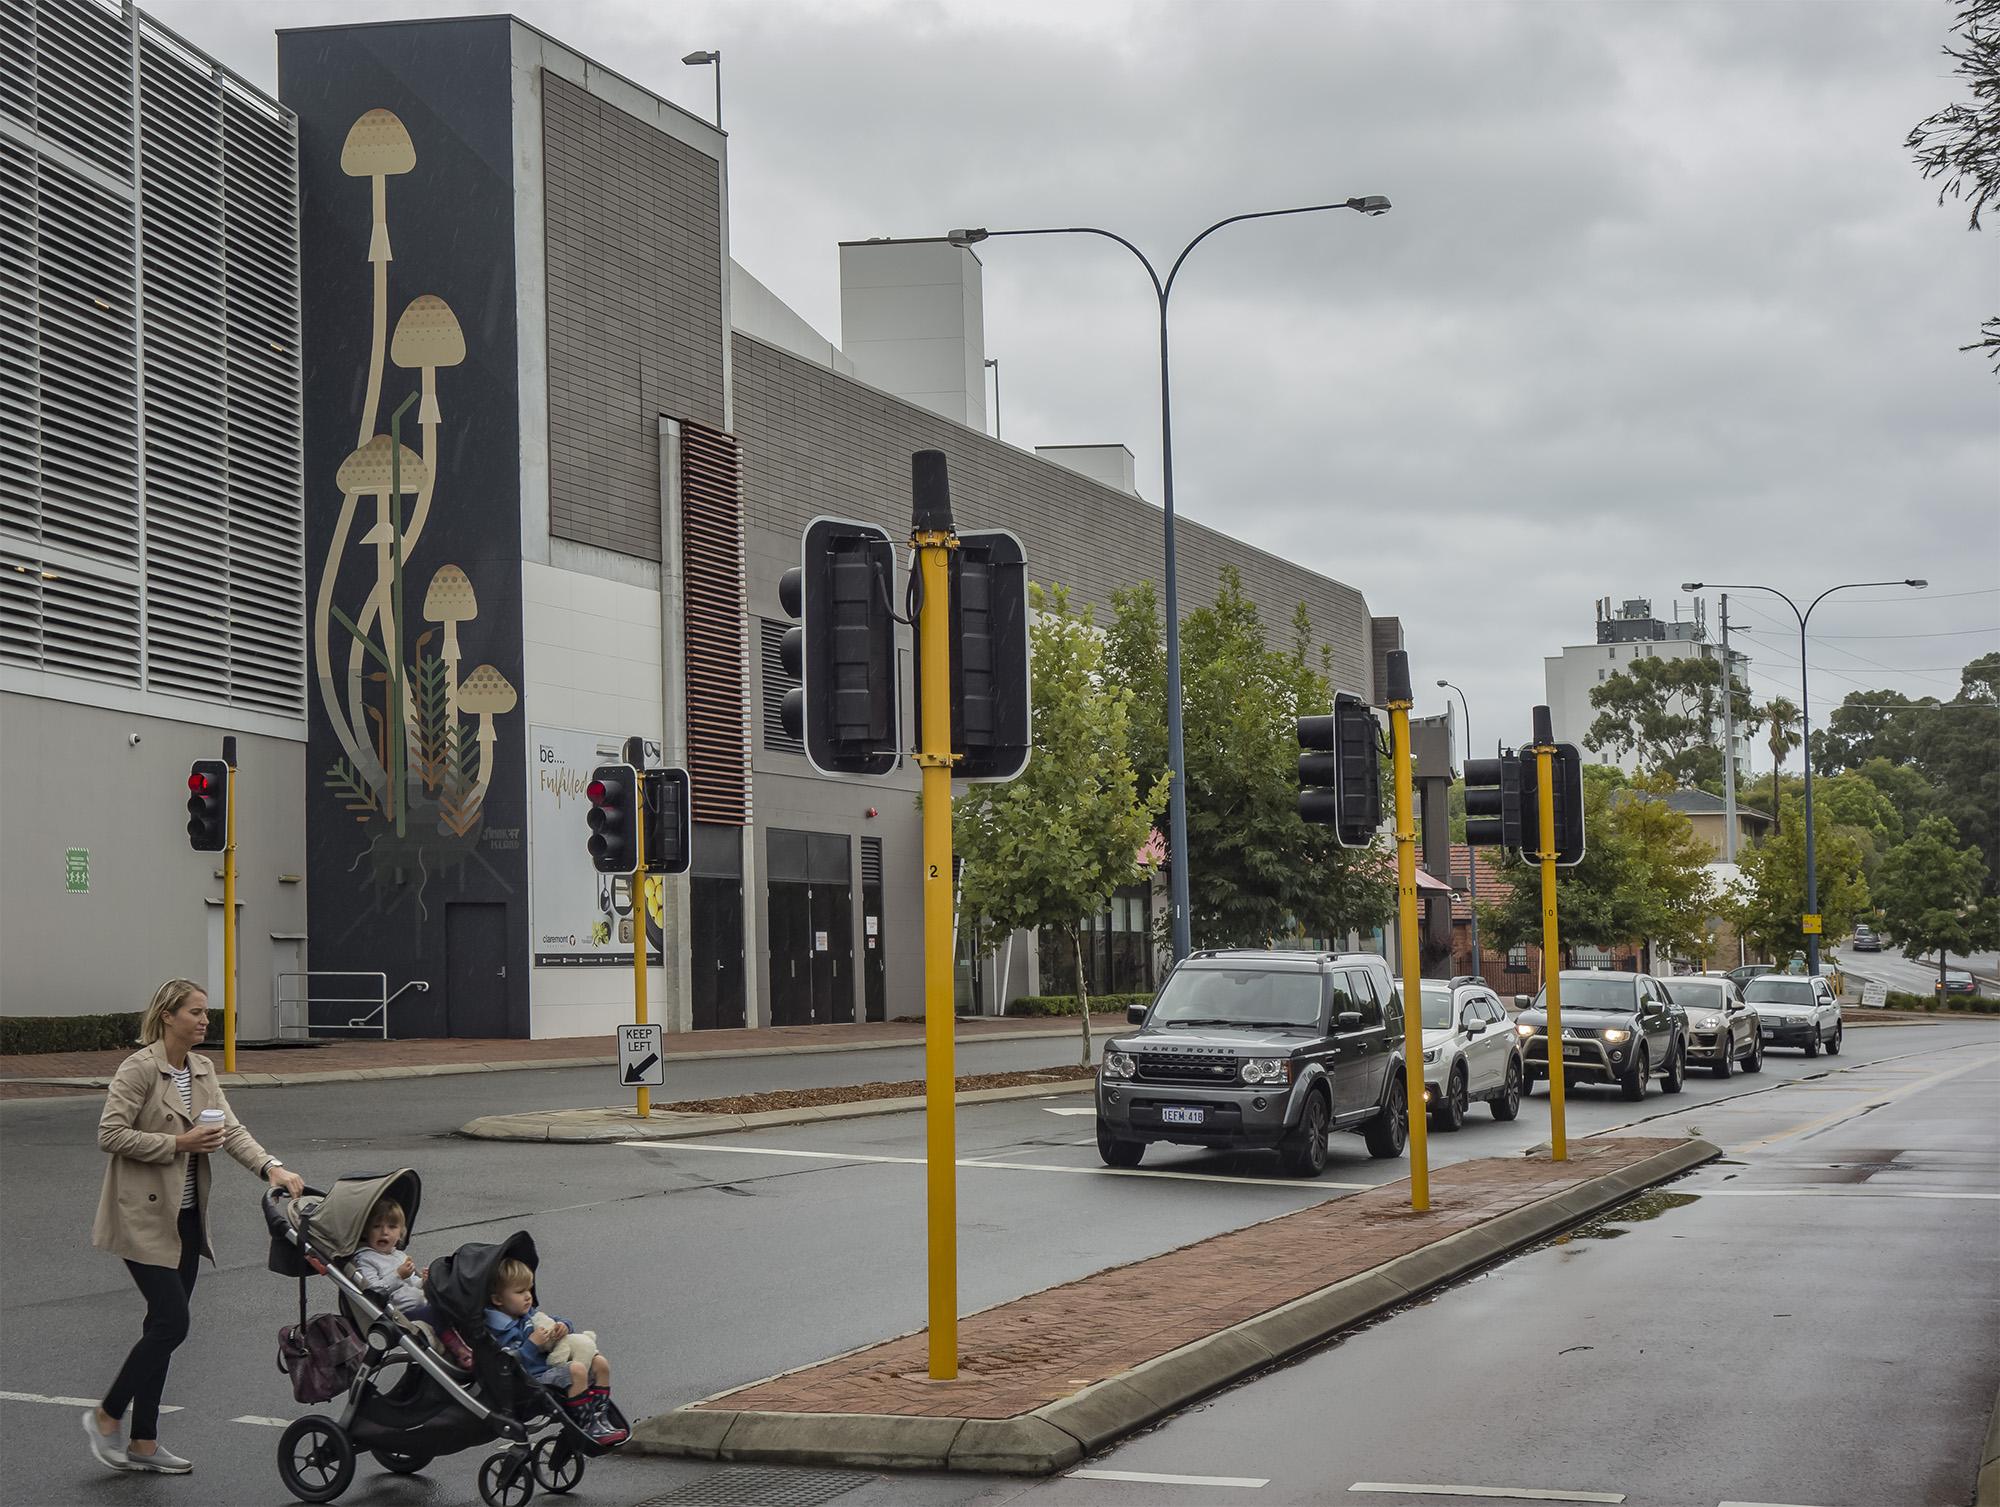 Perth, WA Australia 2017. 'Mushrooms' commissioned by FORM / Claremont Quarters